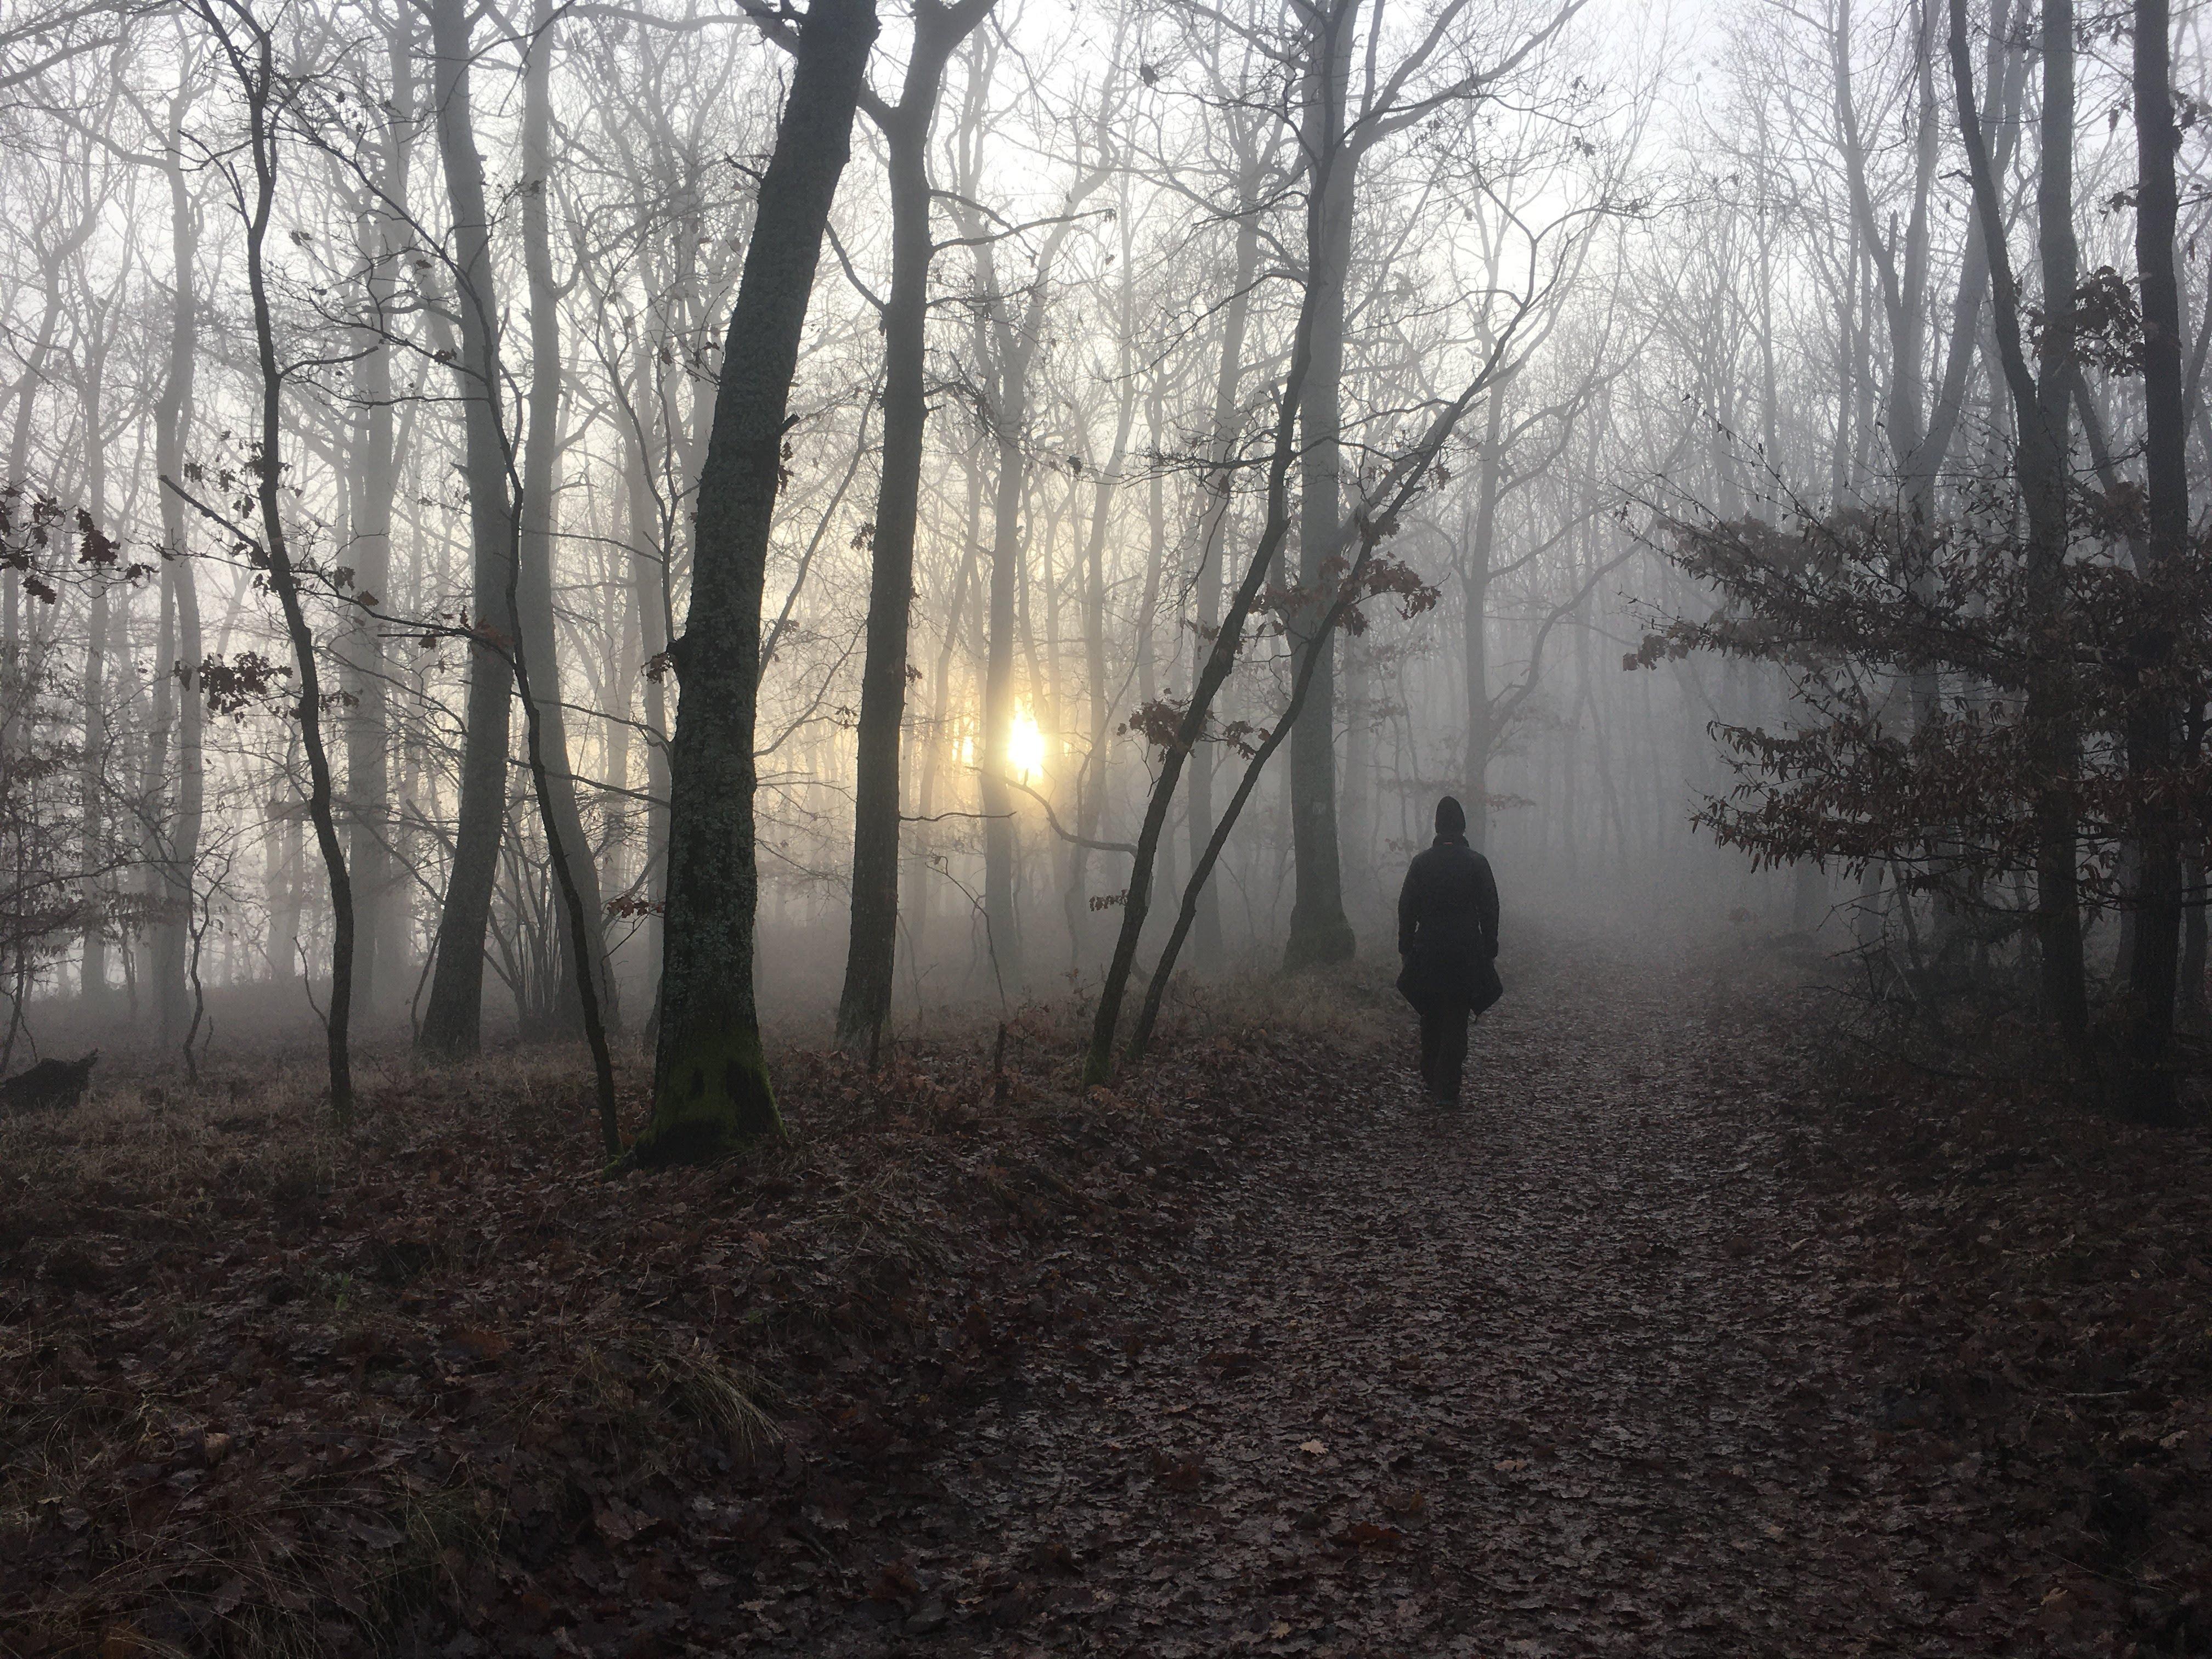 ködös kilátás)